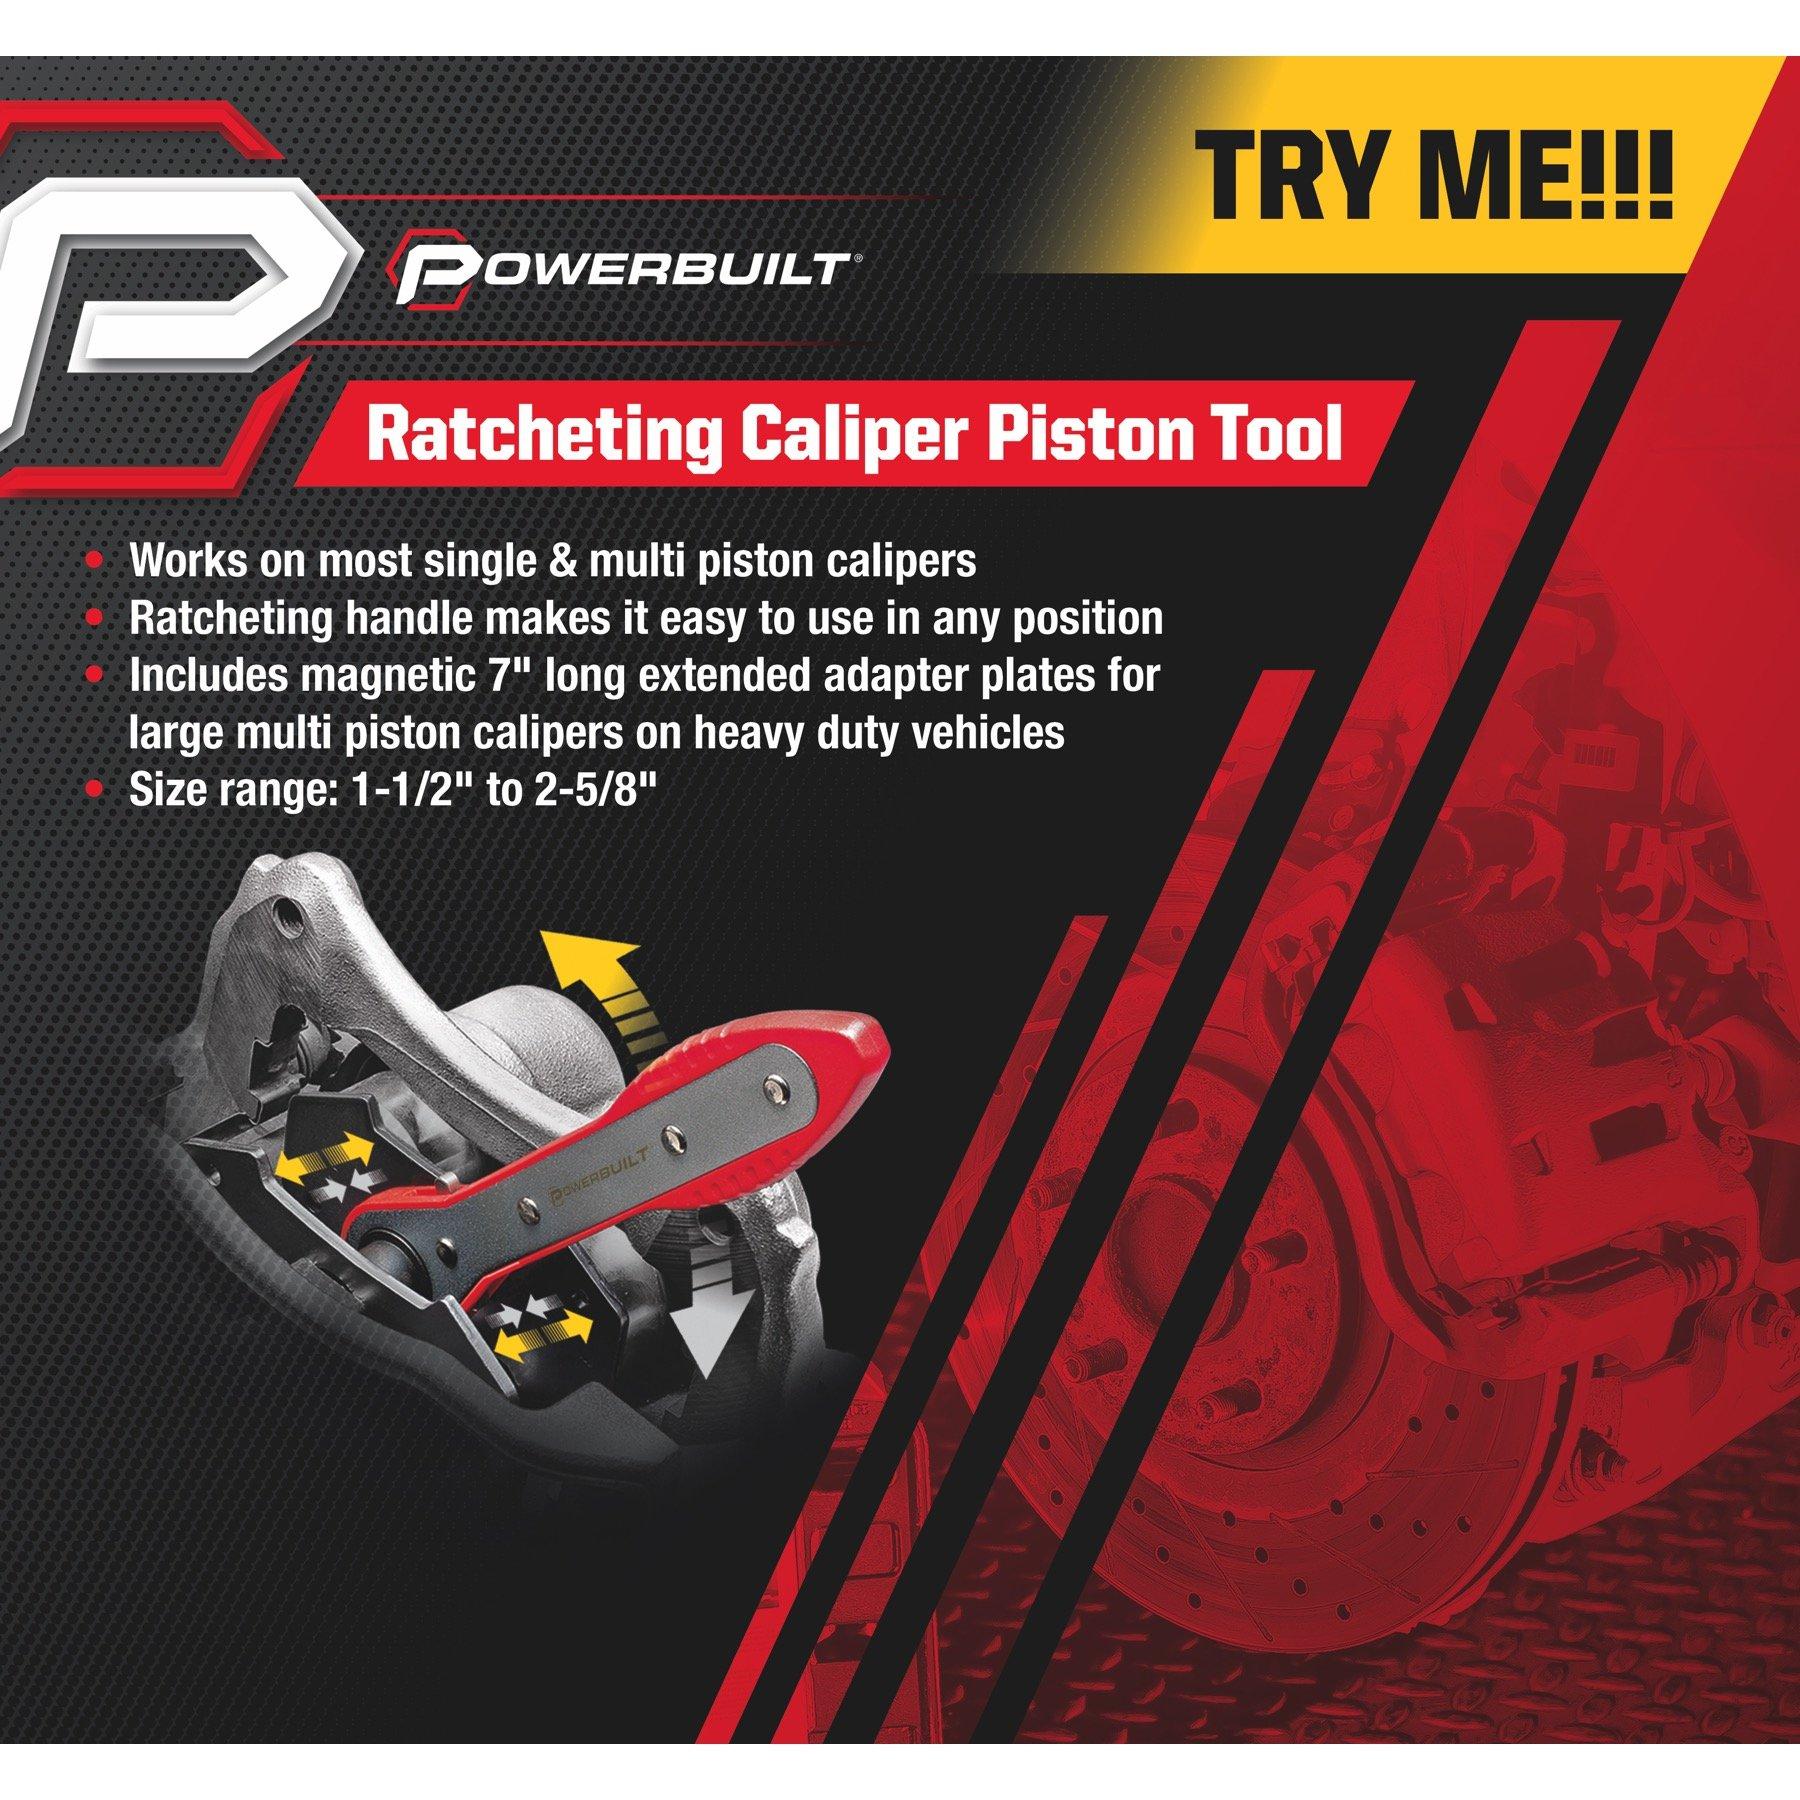 Powerbuilt Ratcheting Brake Caliper Piston Spreader Press Tool - 647861 by Powerbuillt (Image #2)